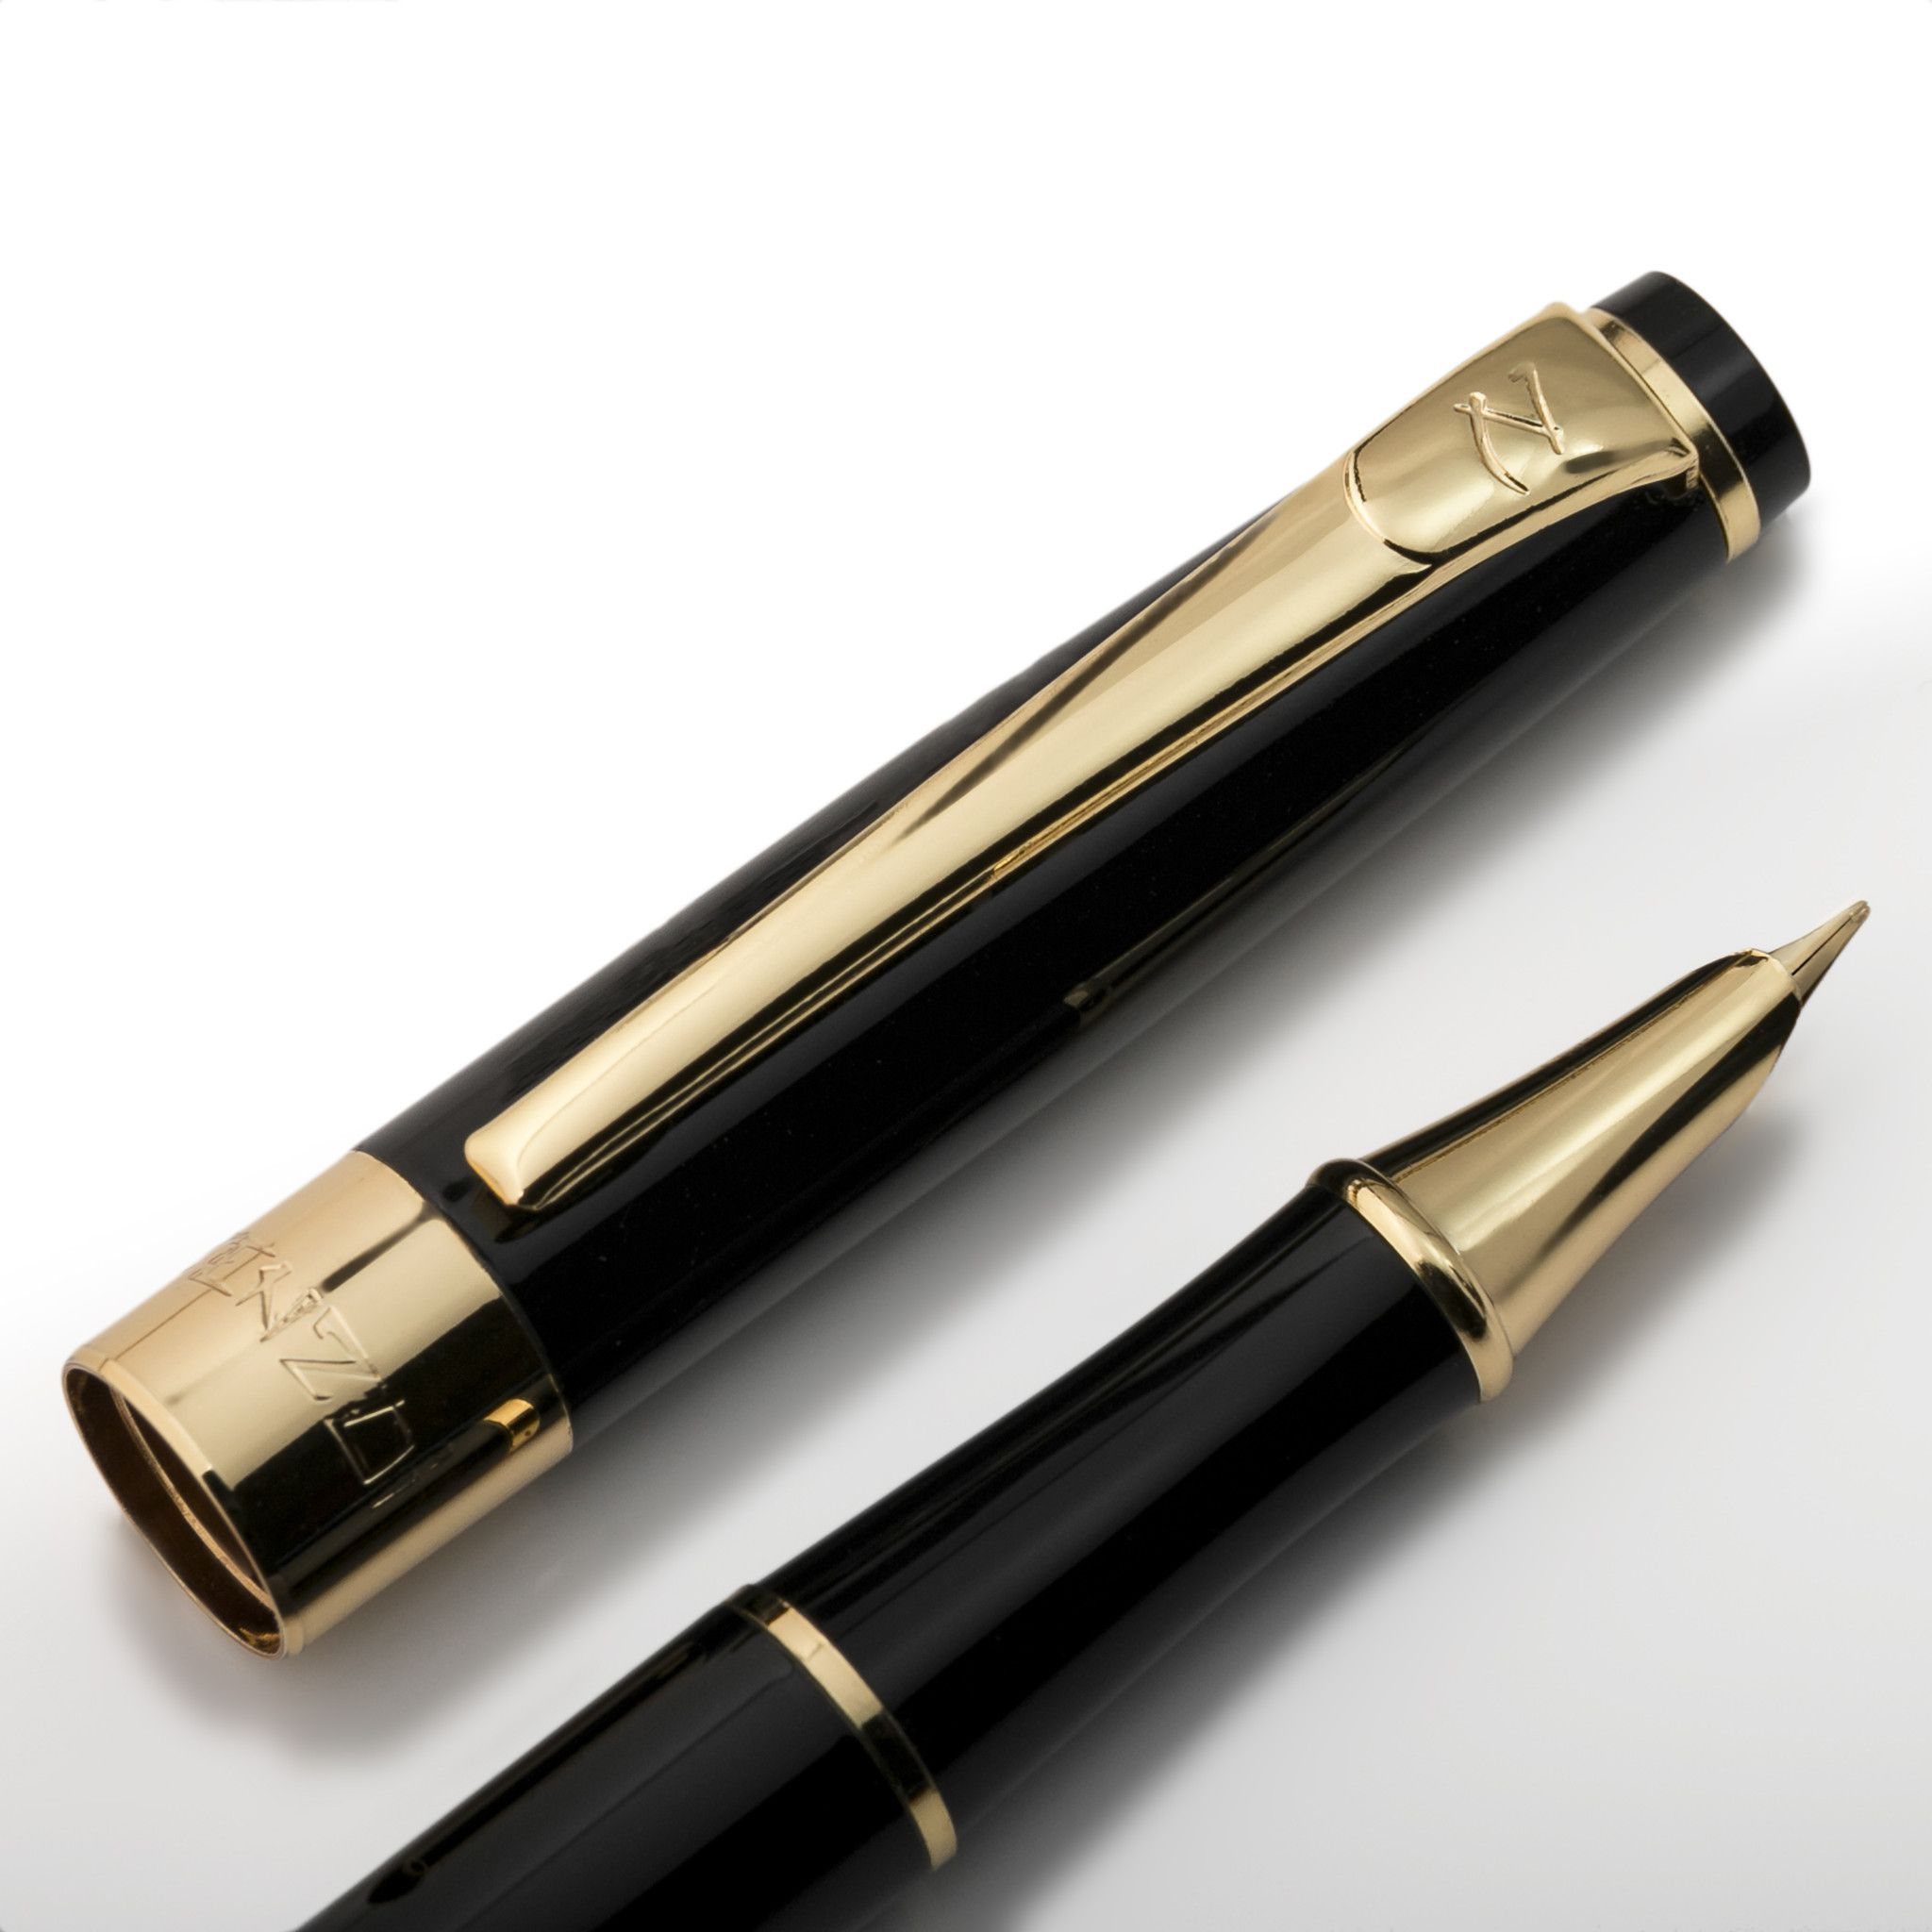 Black /& Gold Pen Ballpoint~Black Ink Refillable